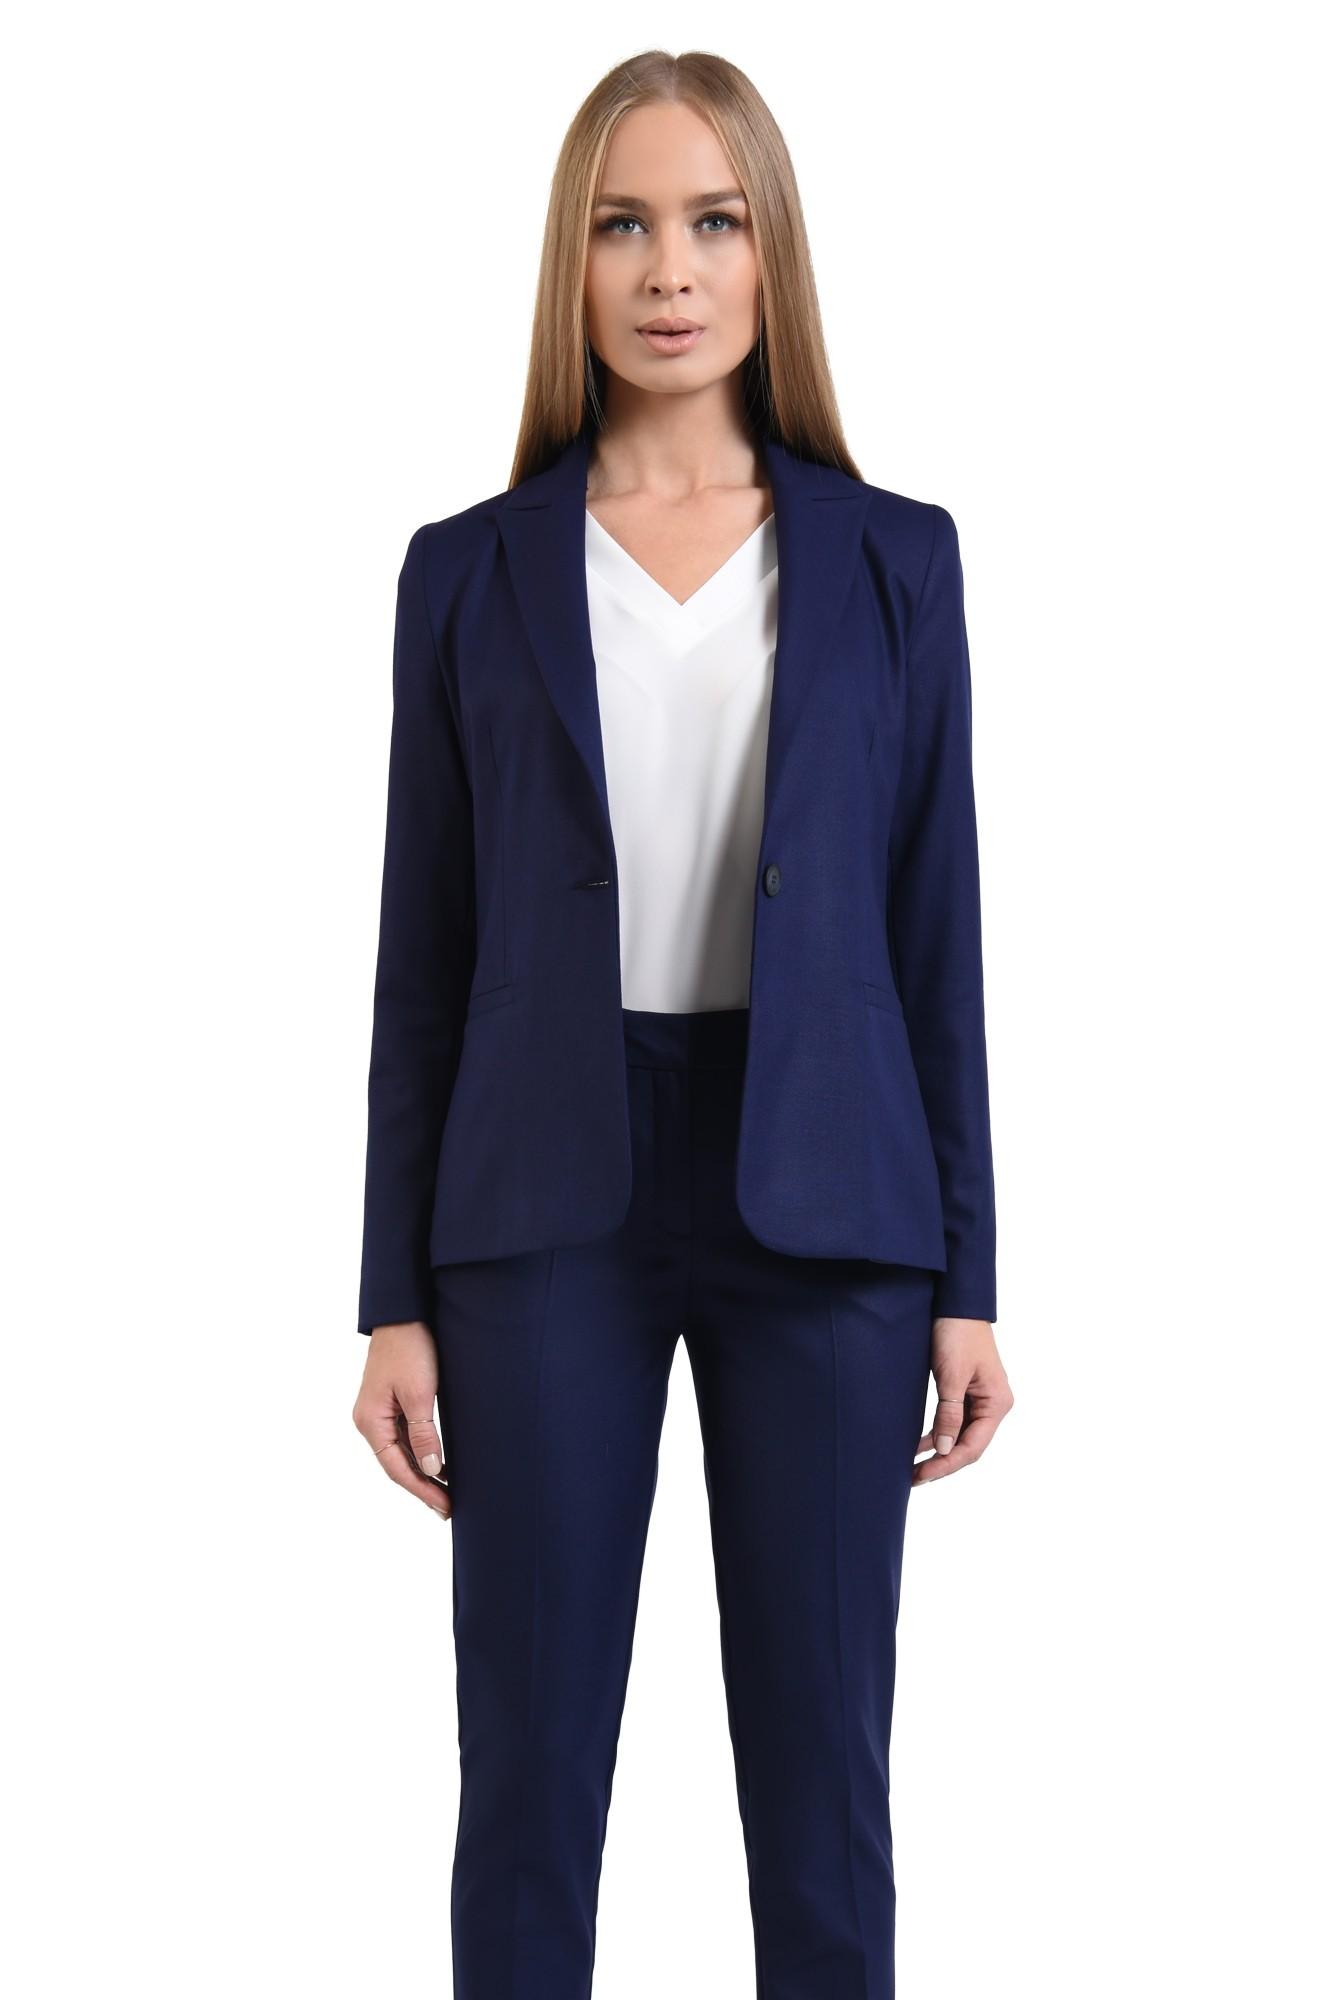 0 - pantaloni tigareta, croi conic, albastru